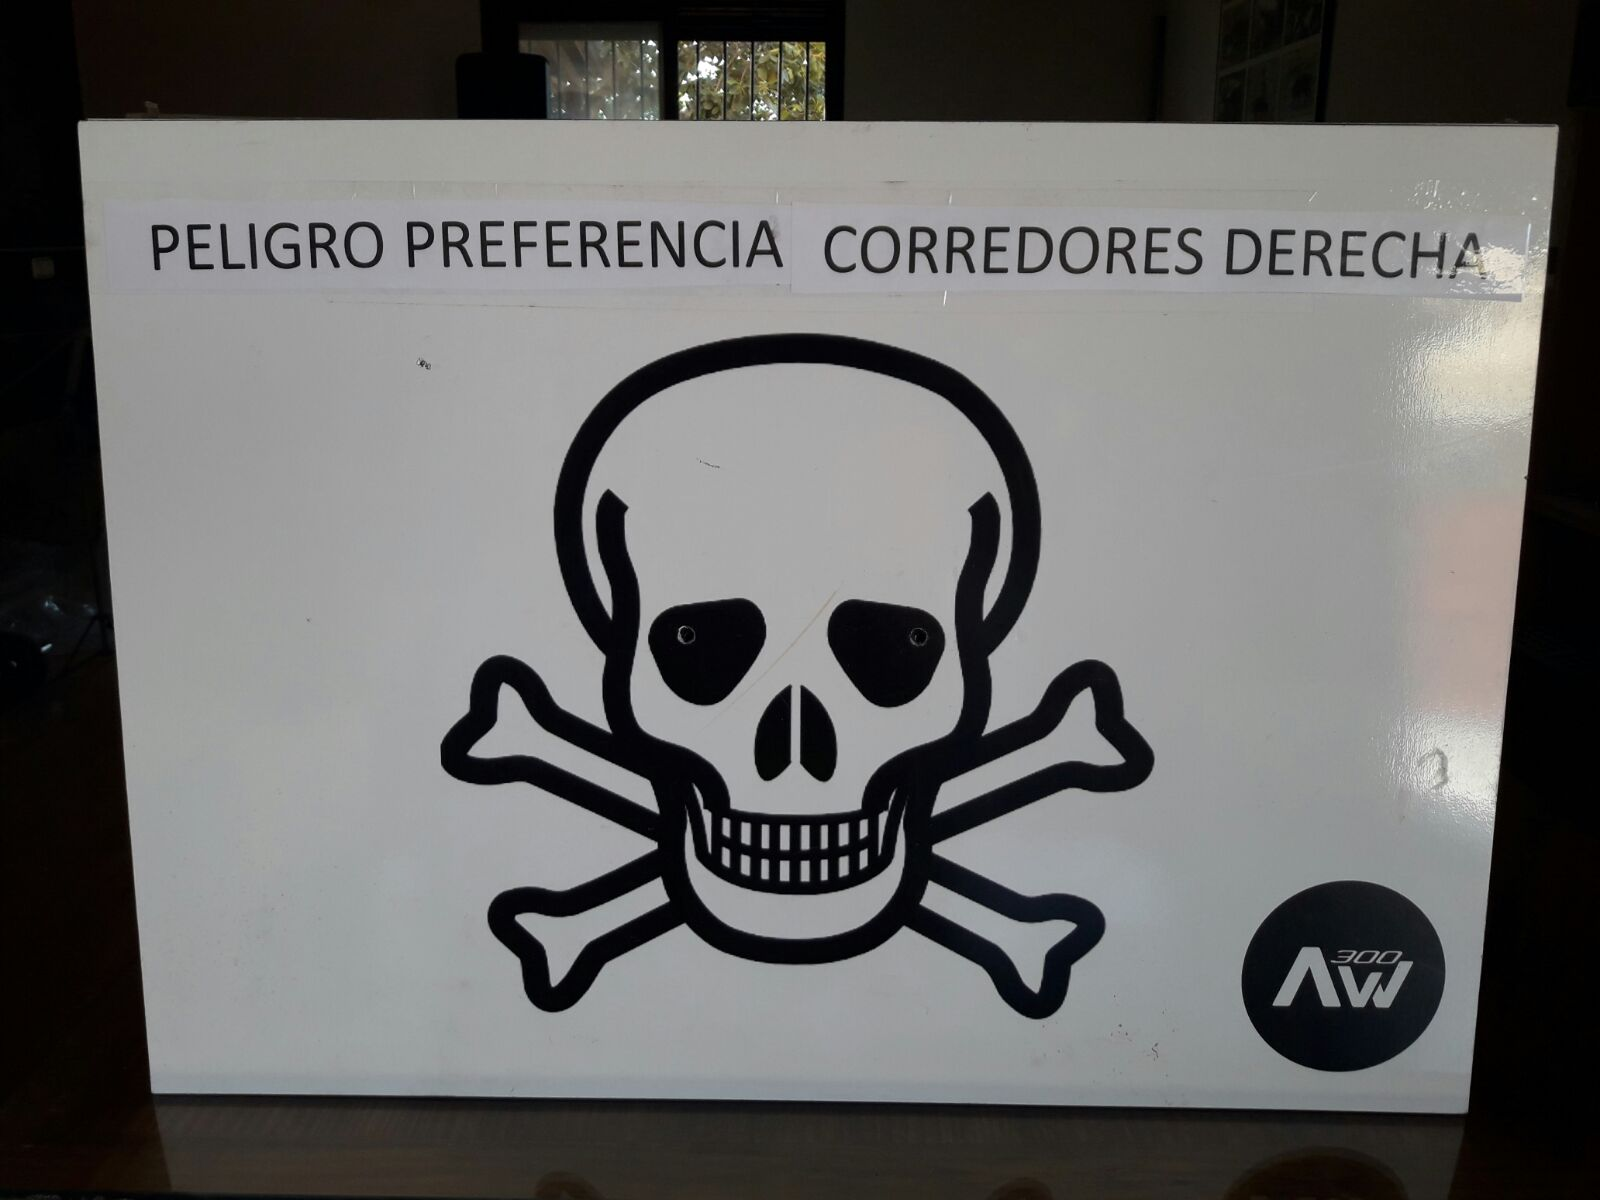 peligro derecha